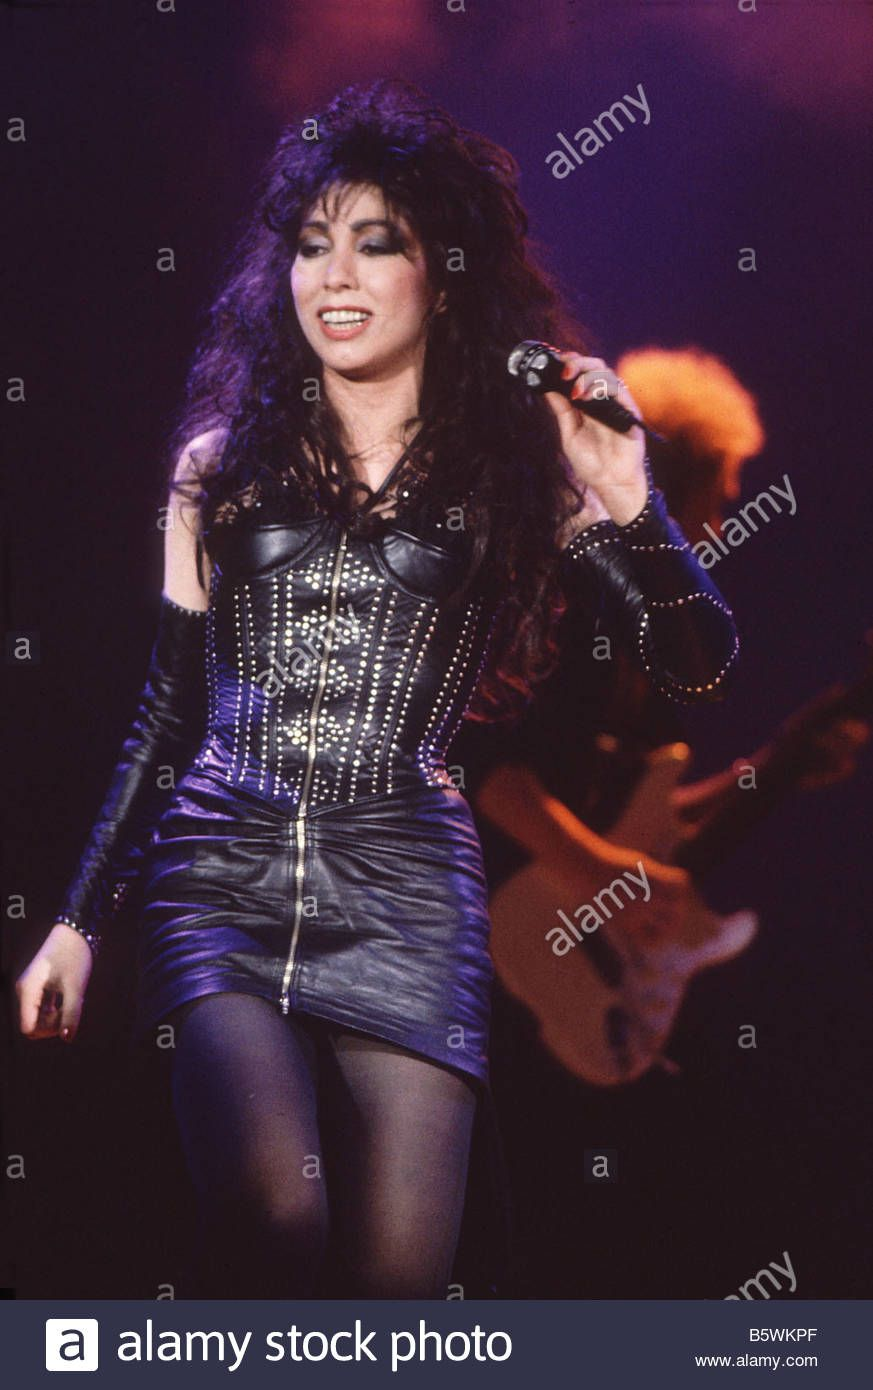 Jennifer Rush Us Singer In 1985 B5wkpf Jpg 873 1390 Strumpfhosen Outfit Frau Outfit